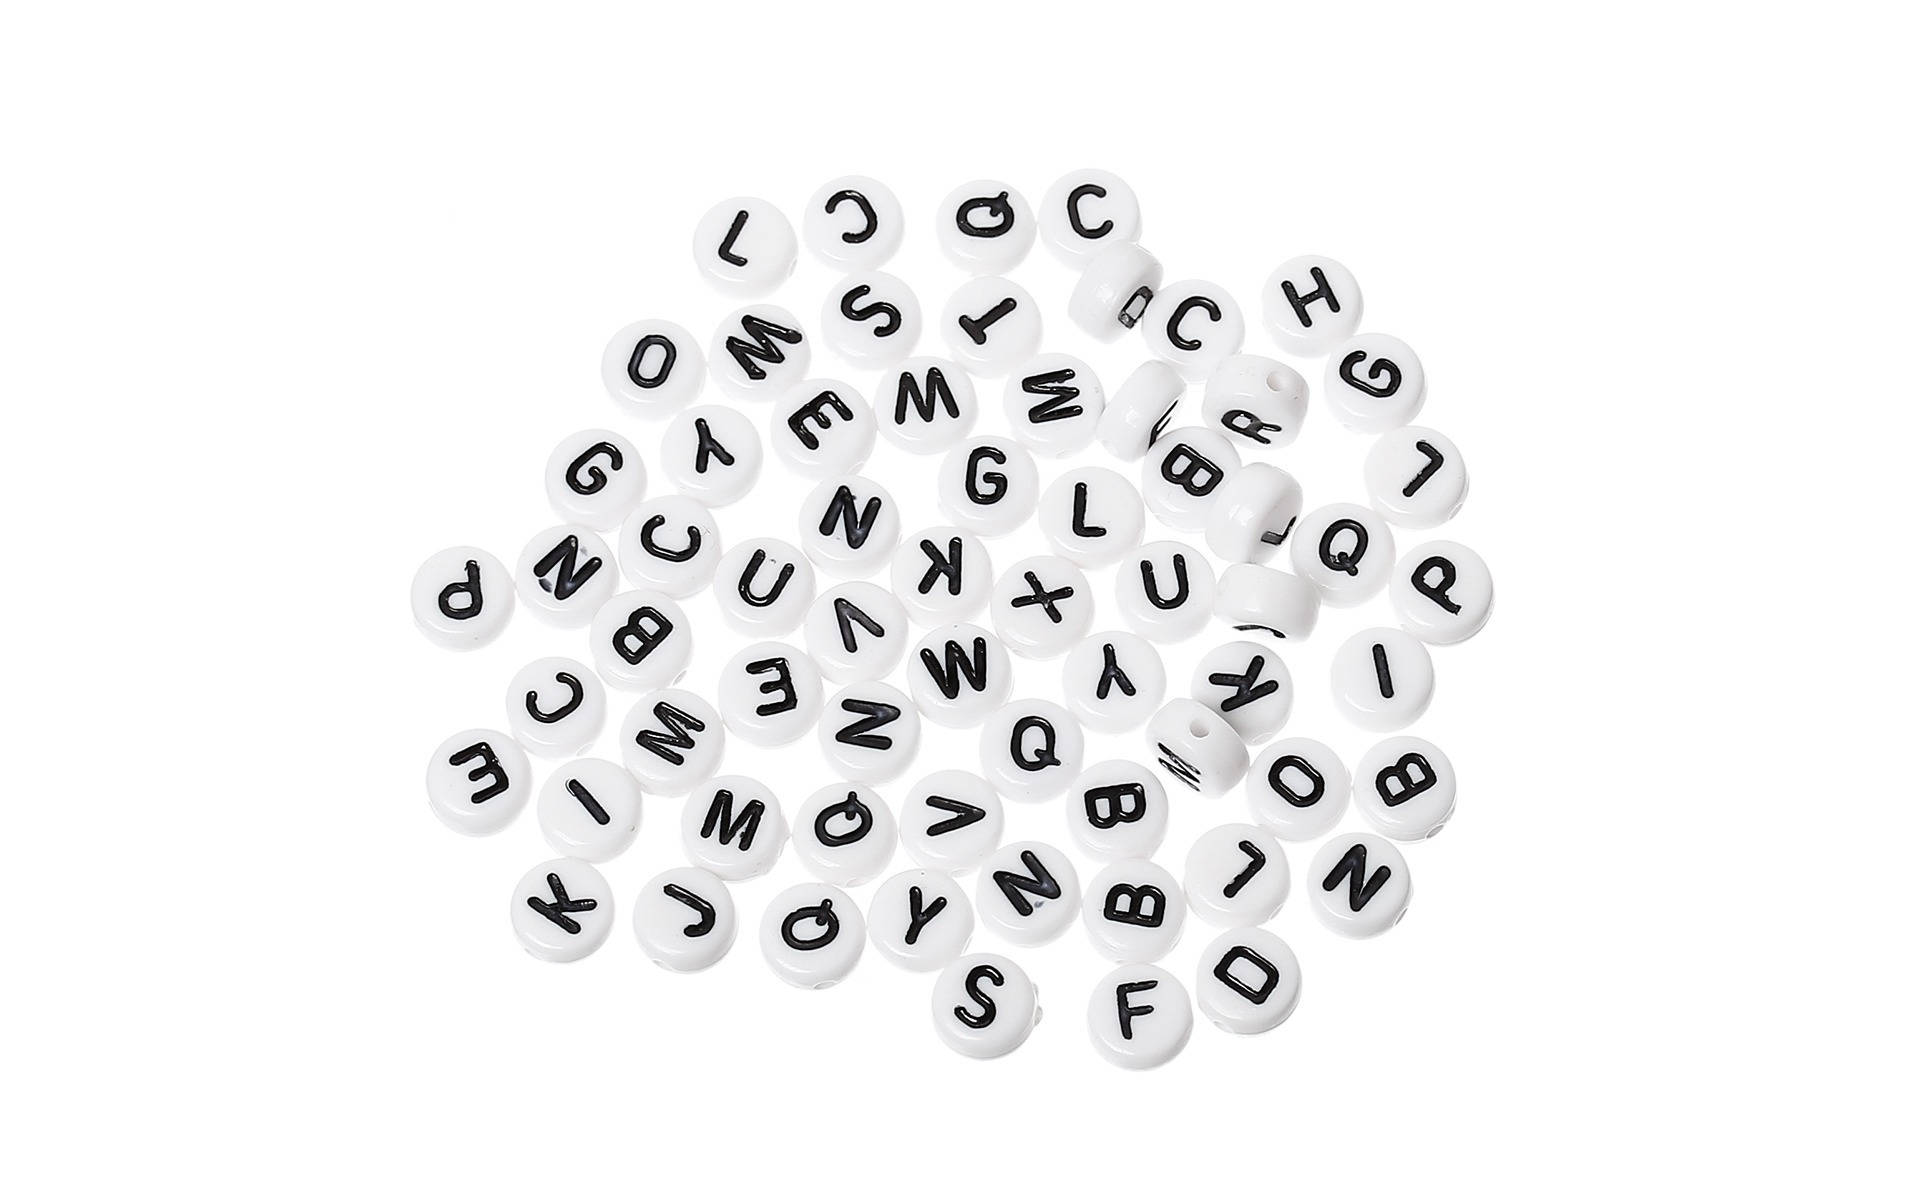 Perles ALPHABET lettre noire recto verso acrylique blanche 7 mm